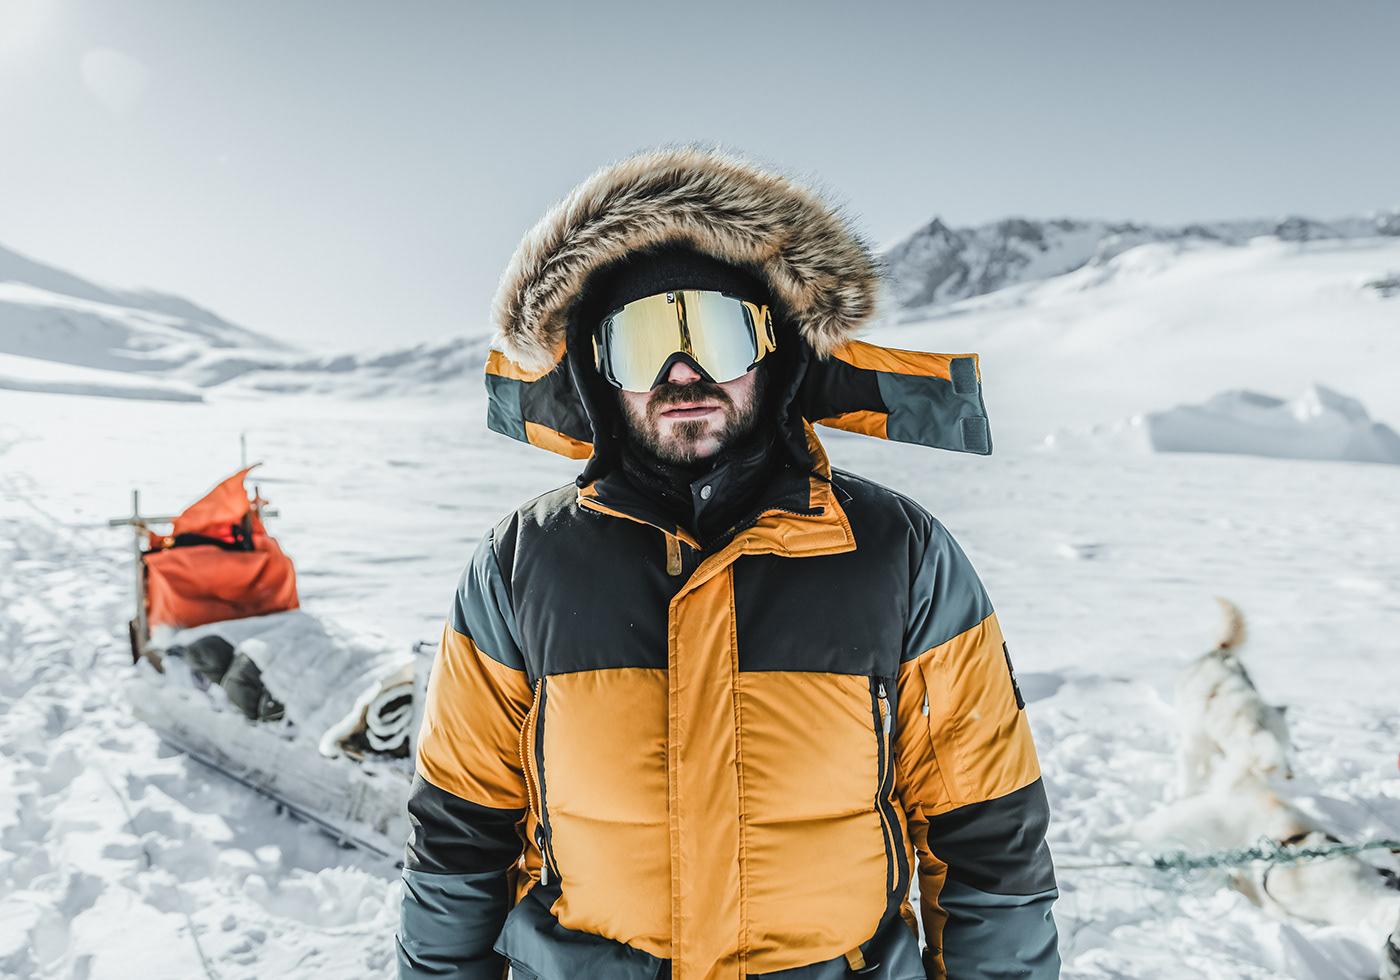 Greenland Arctic winter dogs snow remote ice White Nature Landscape